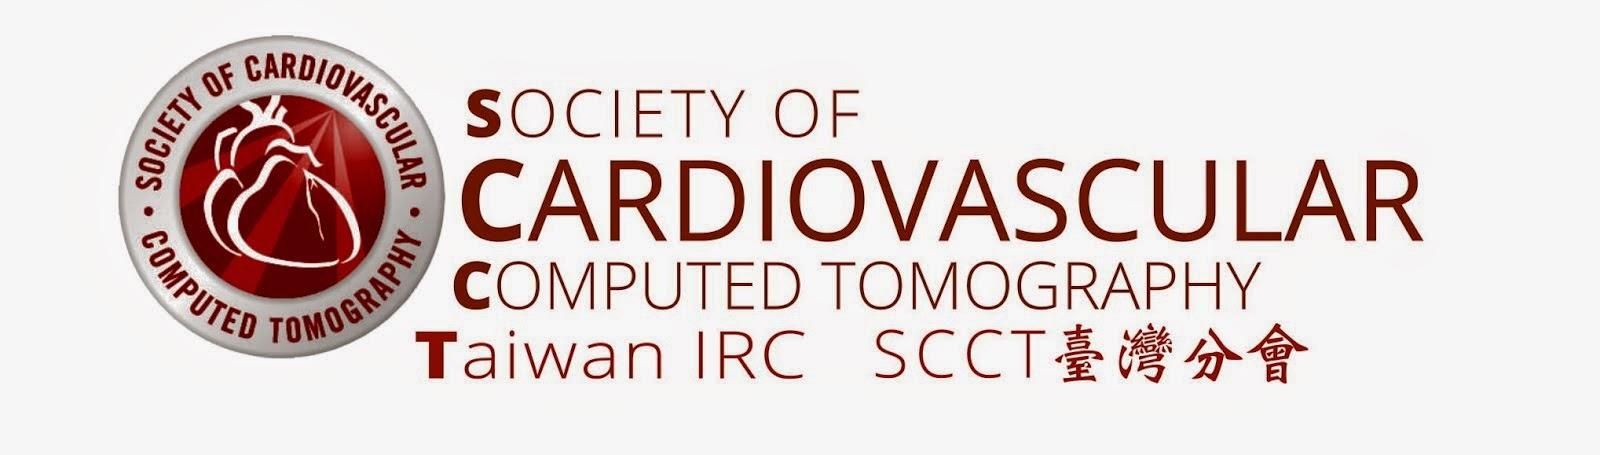 SCCT TAIWAN IRC